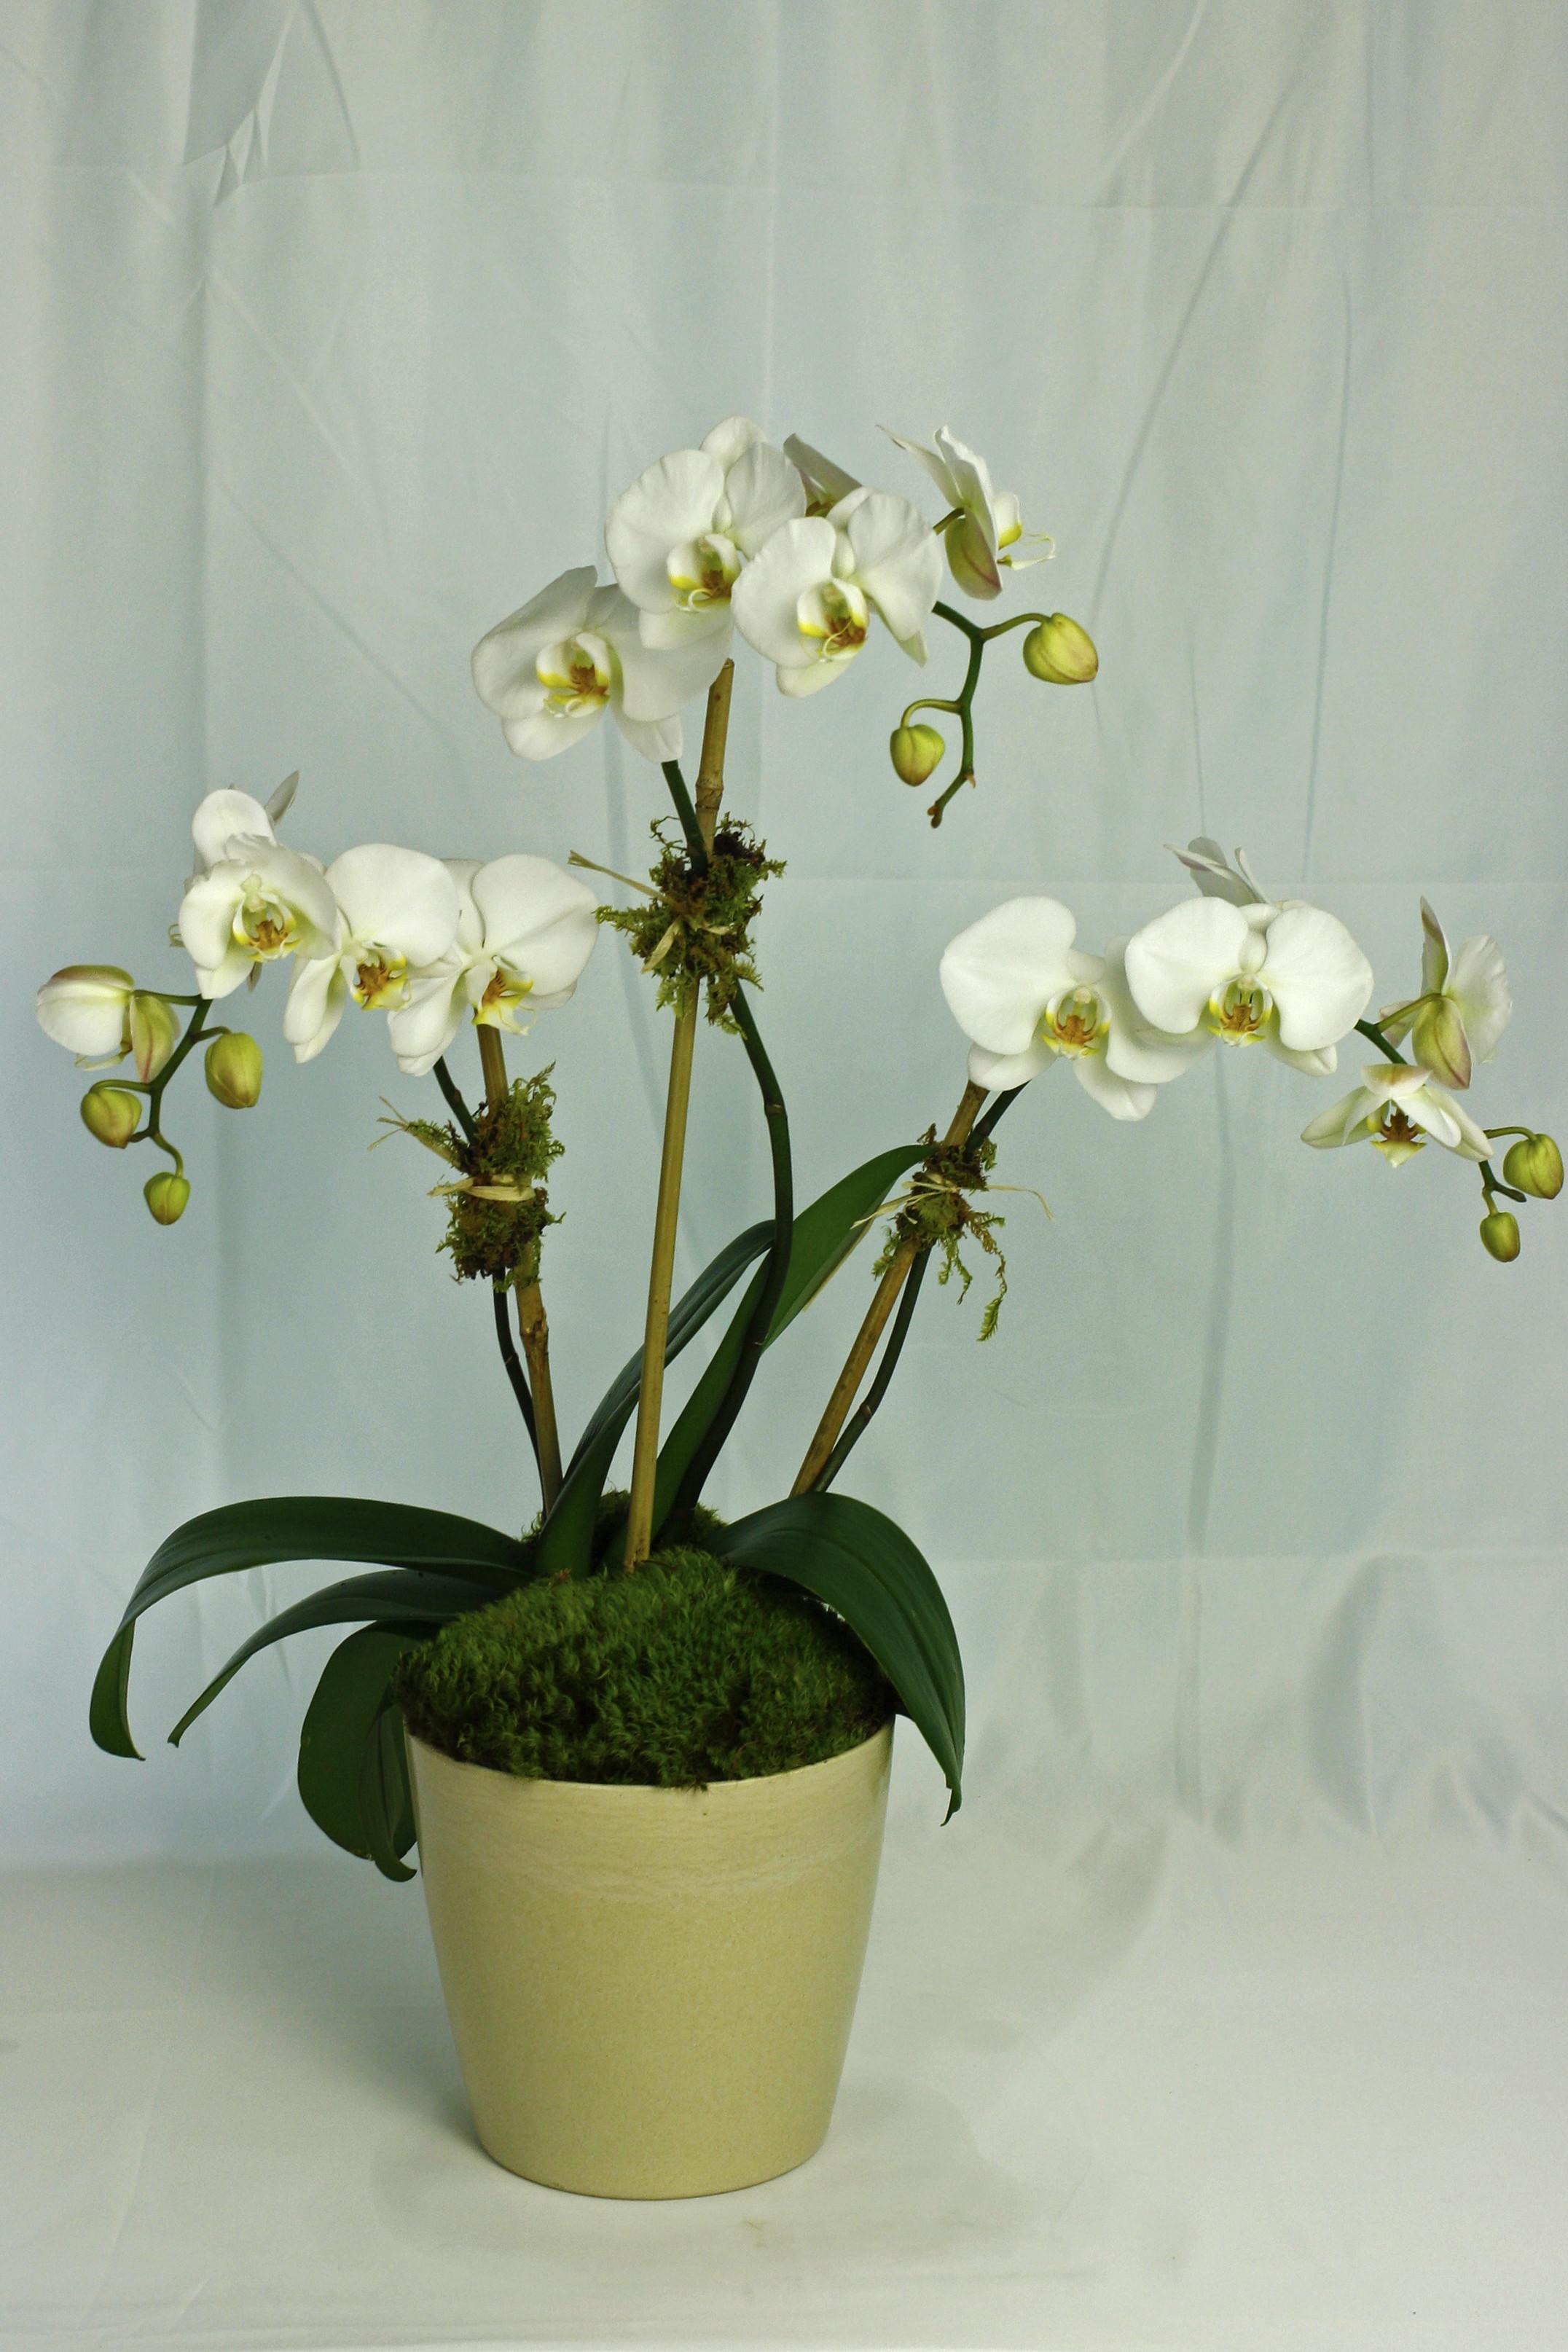 Grand Orchid Garden $100 -